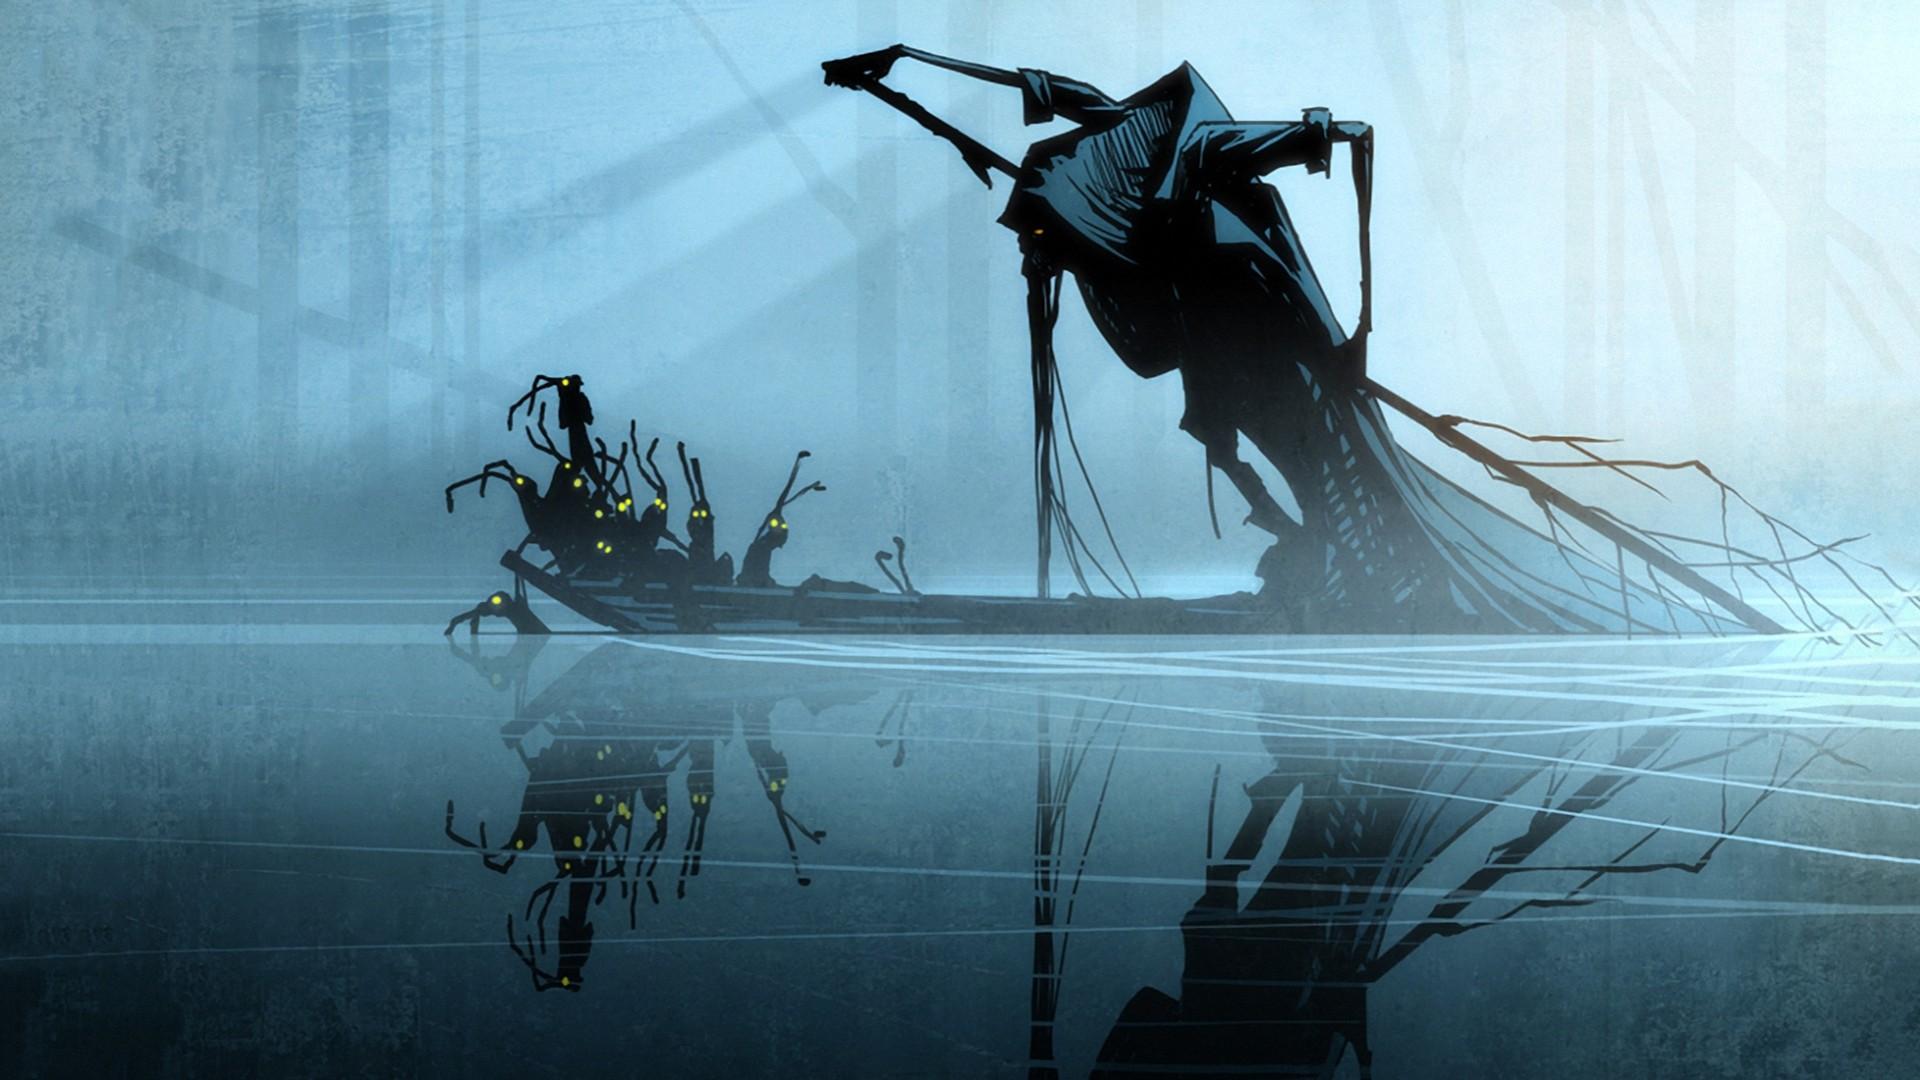 Wallpaper : Creepy, Reflection, Skeleton, Evil, Corpse